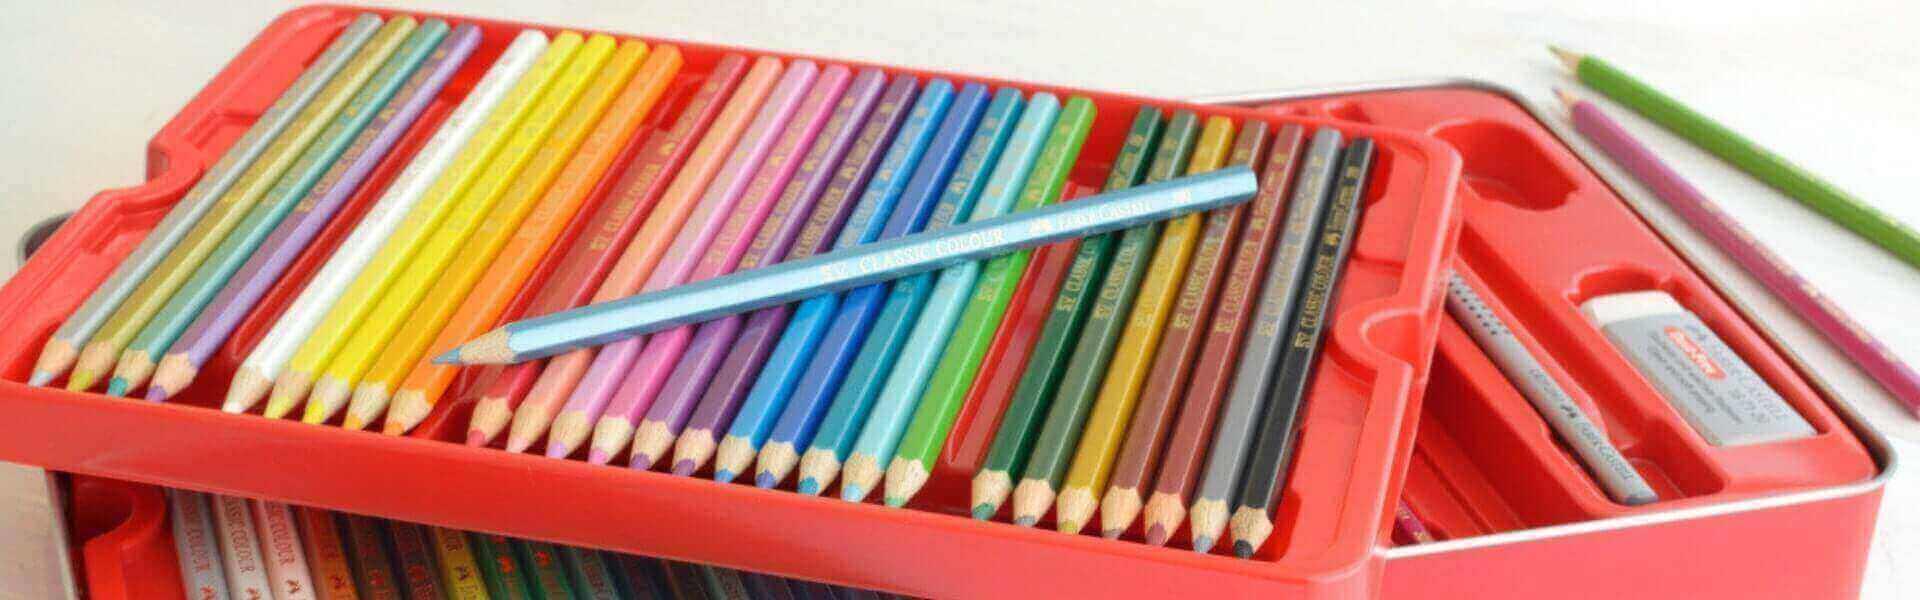 Карандаши цветные Faber-Castell CLASSIC